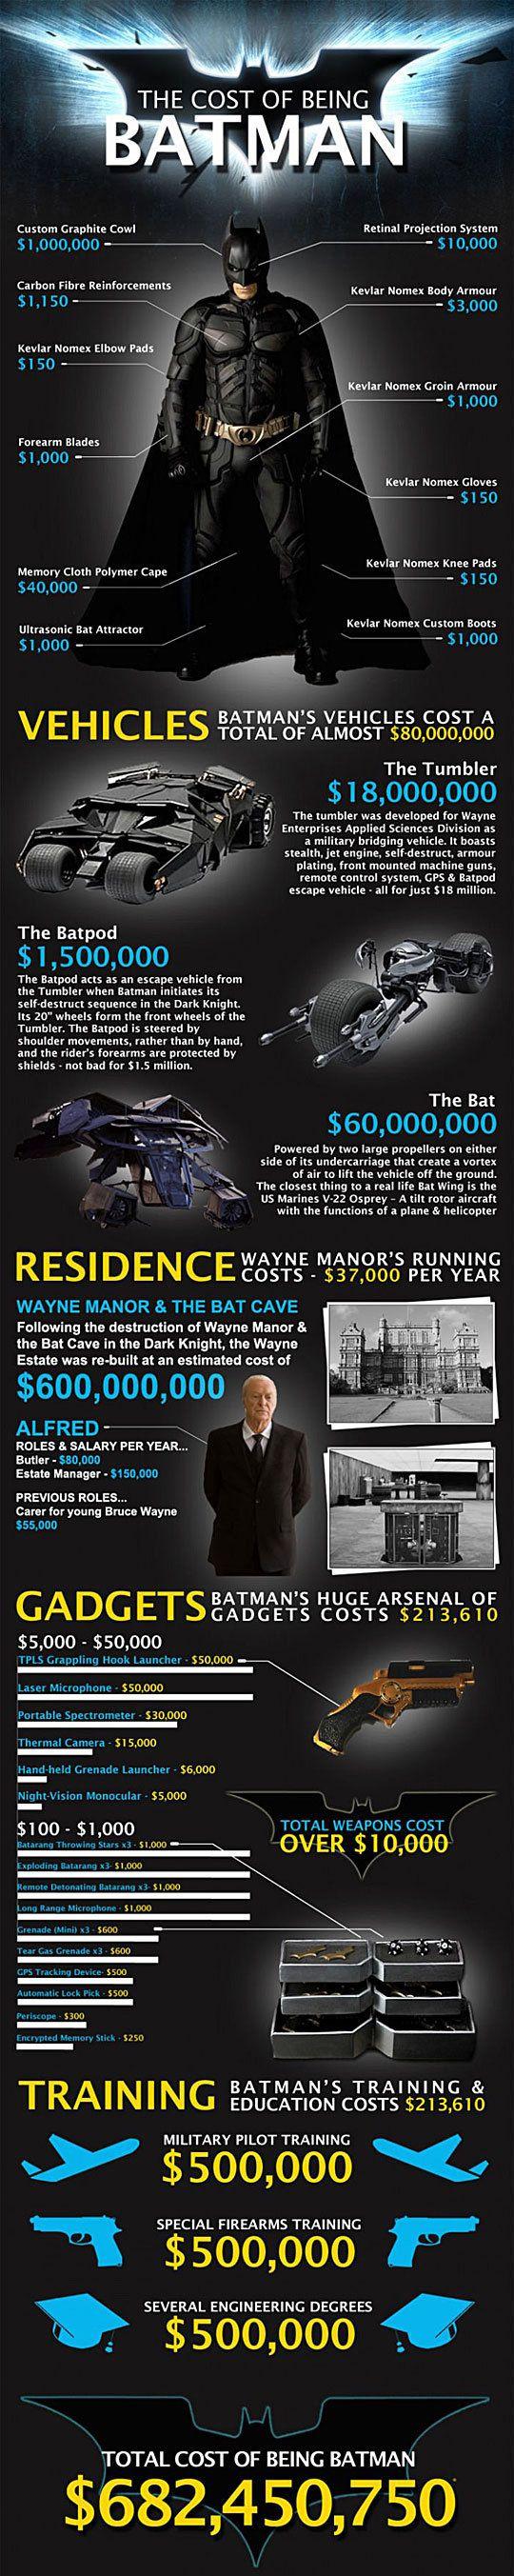 He's expensive! The Cost of Being Batman - BILLIONAIRES, Y U NO BECOME BATMAN!?